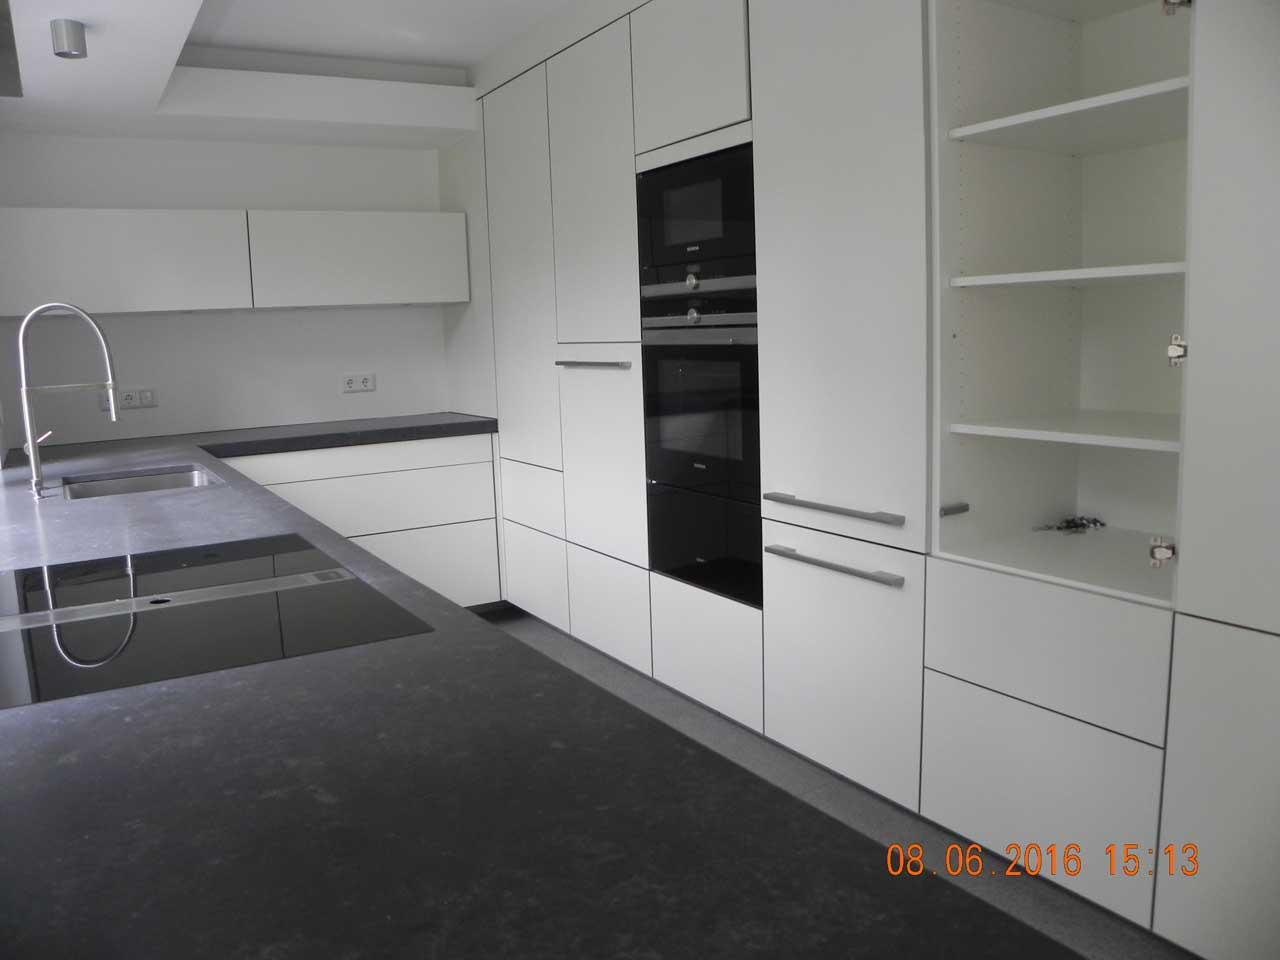 Küche & Kamin - Fertig 18